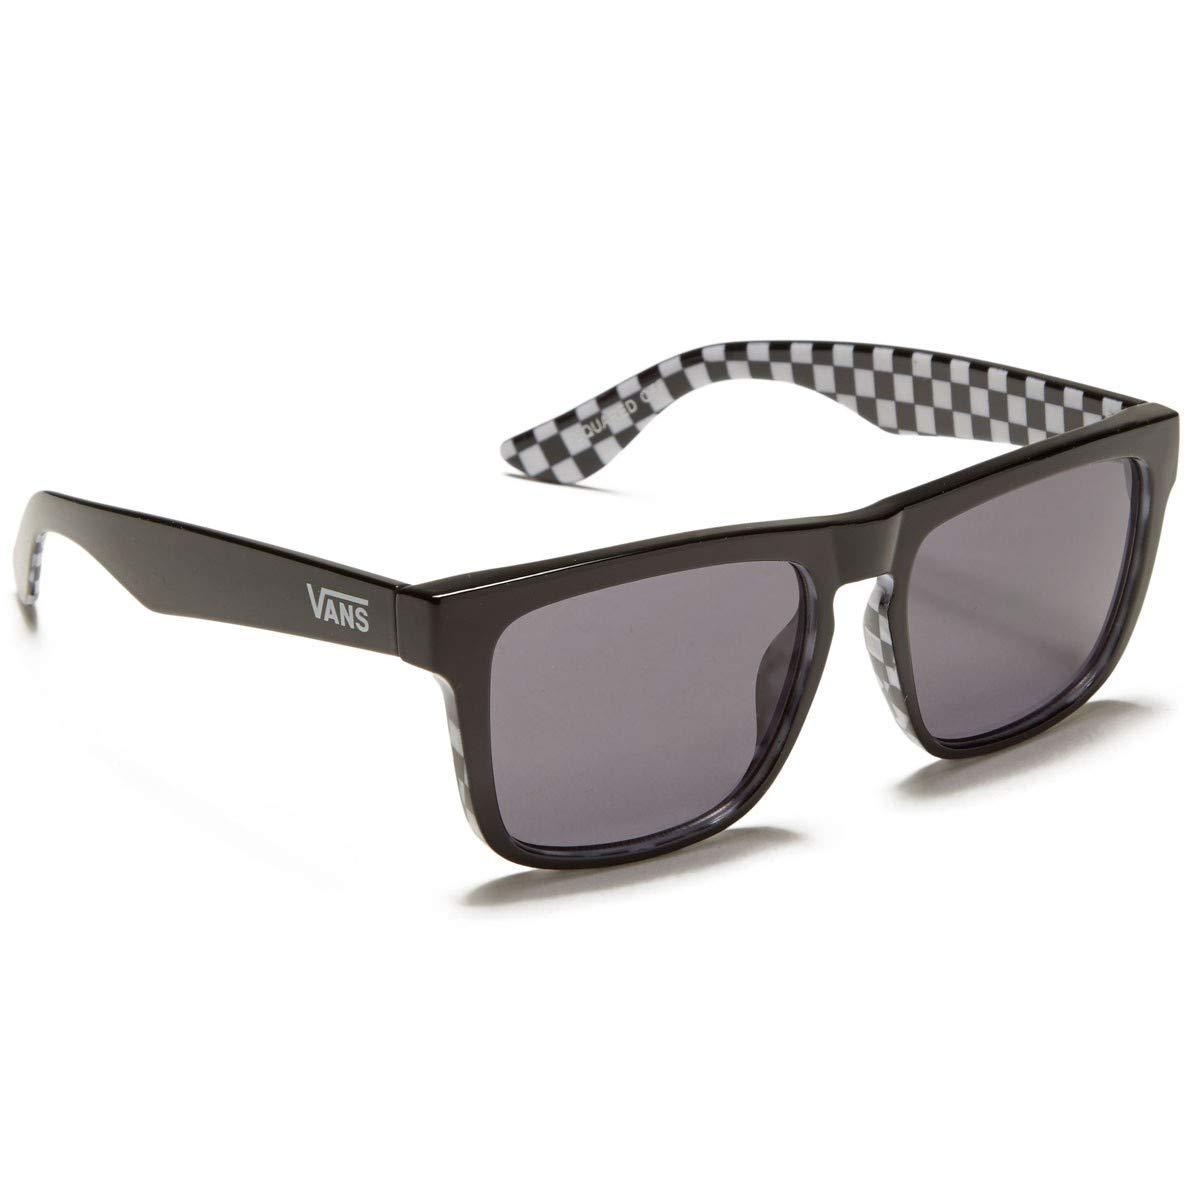 Vans Gafas de sol Squared Off Checkerboard Negro Sin talla ...